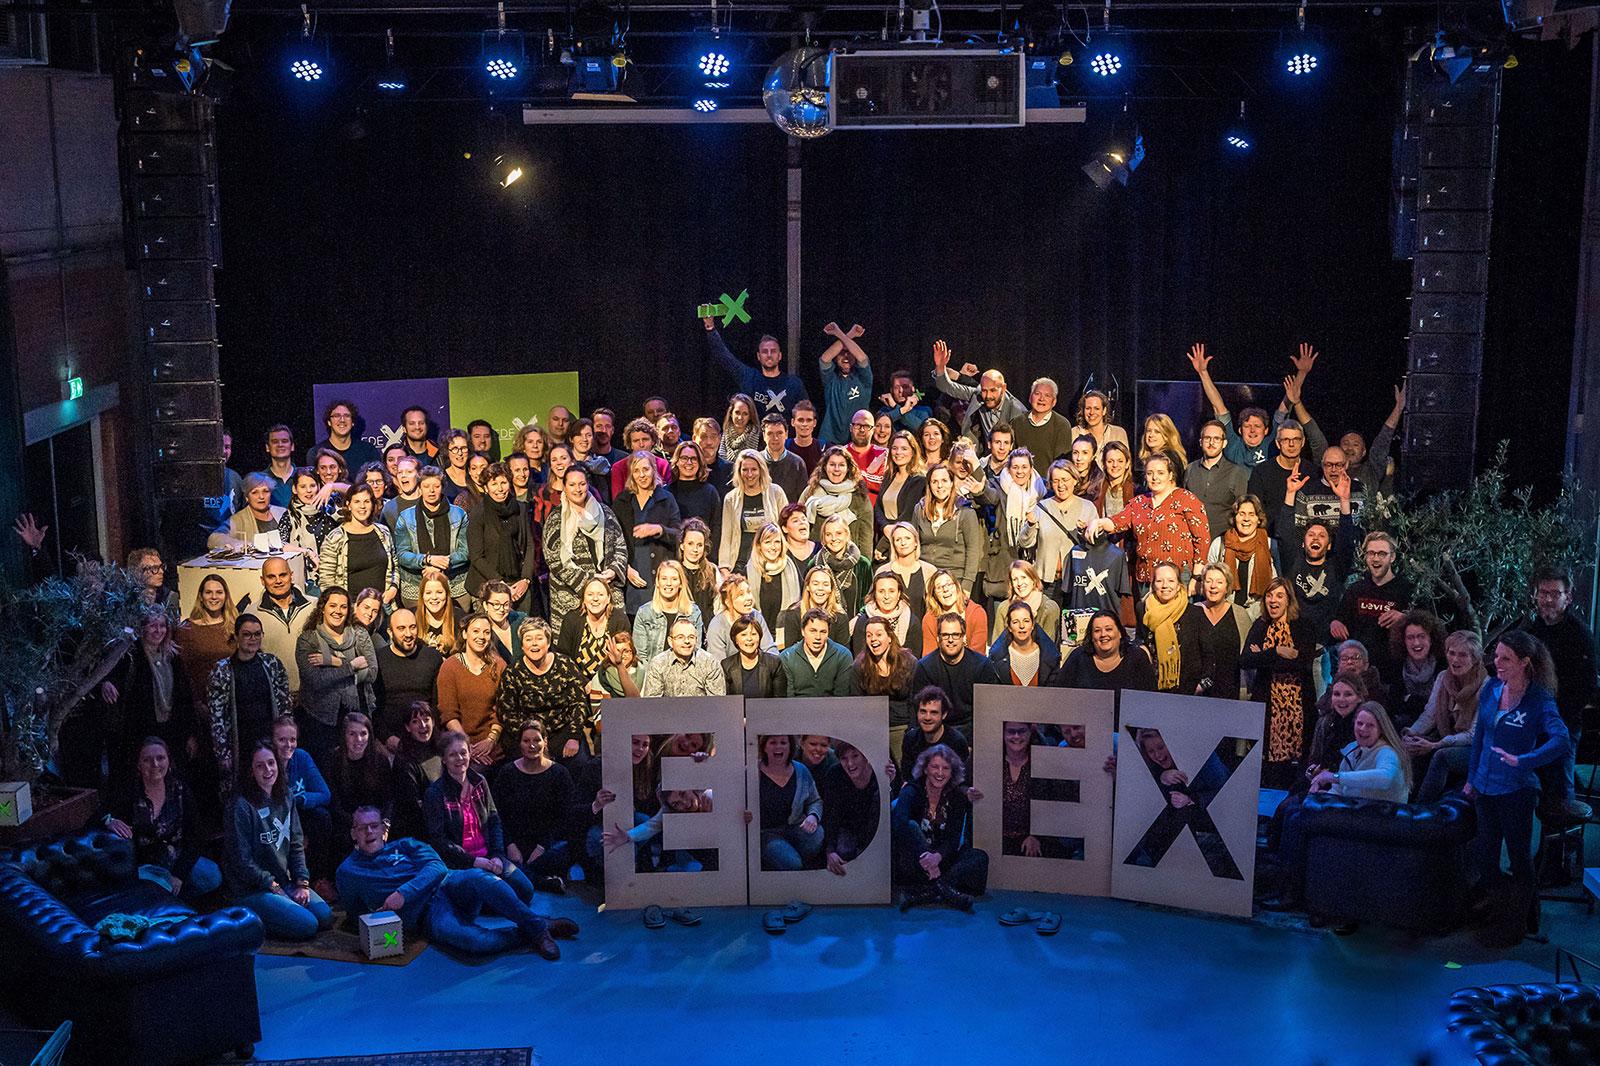 EDEX event - grote groeps foto van alle deelnemers